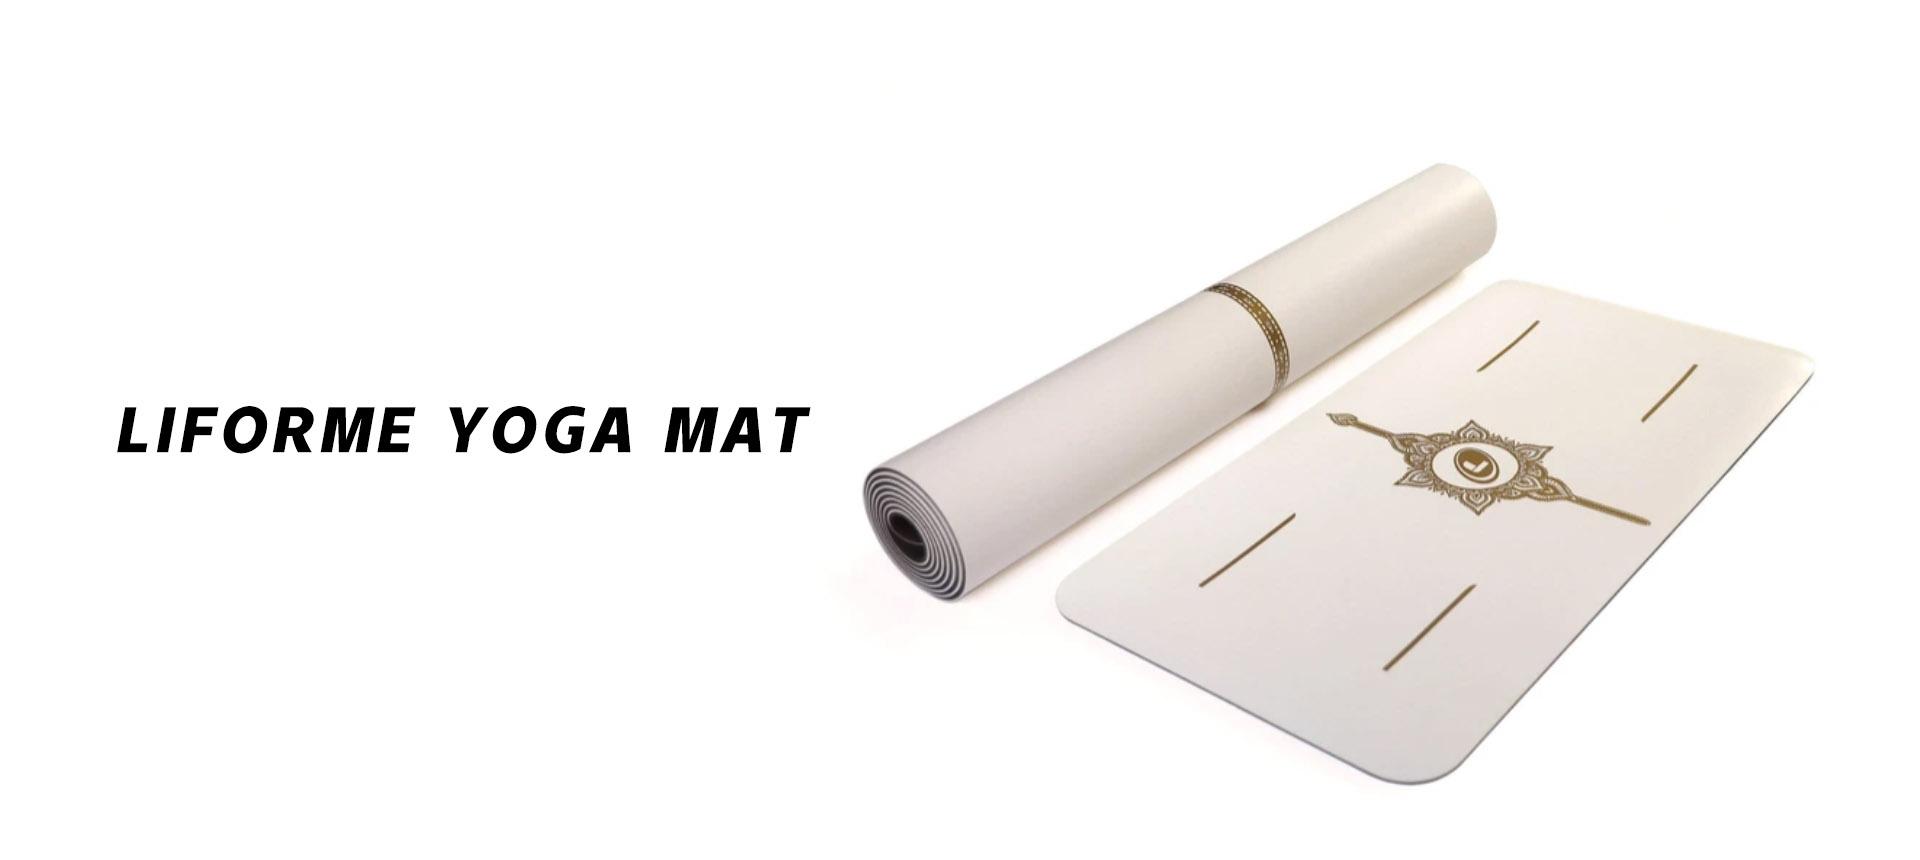 Liforme-Yoga-Mat